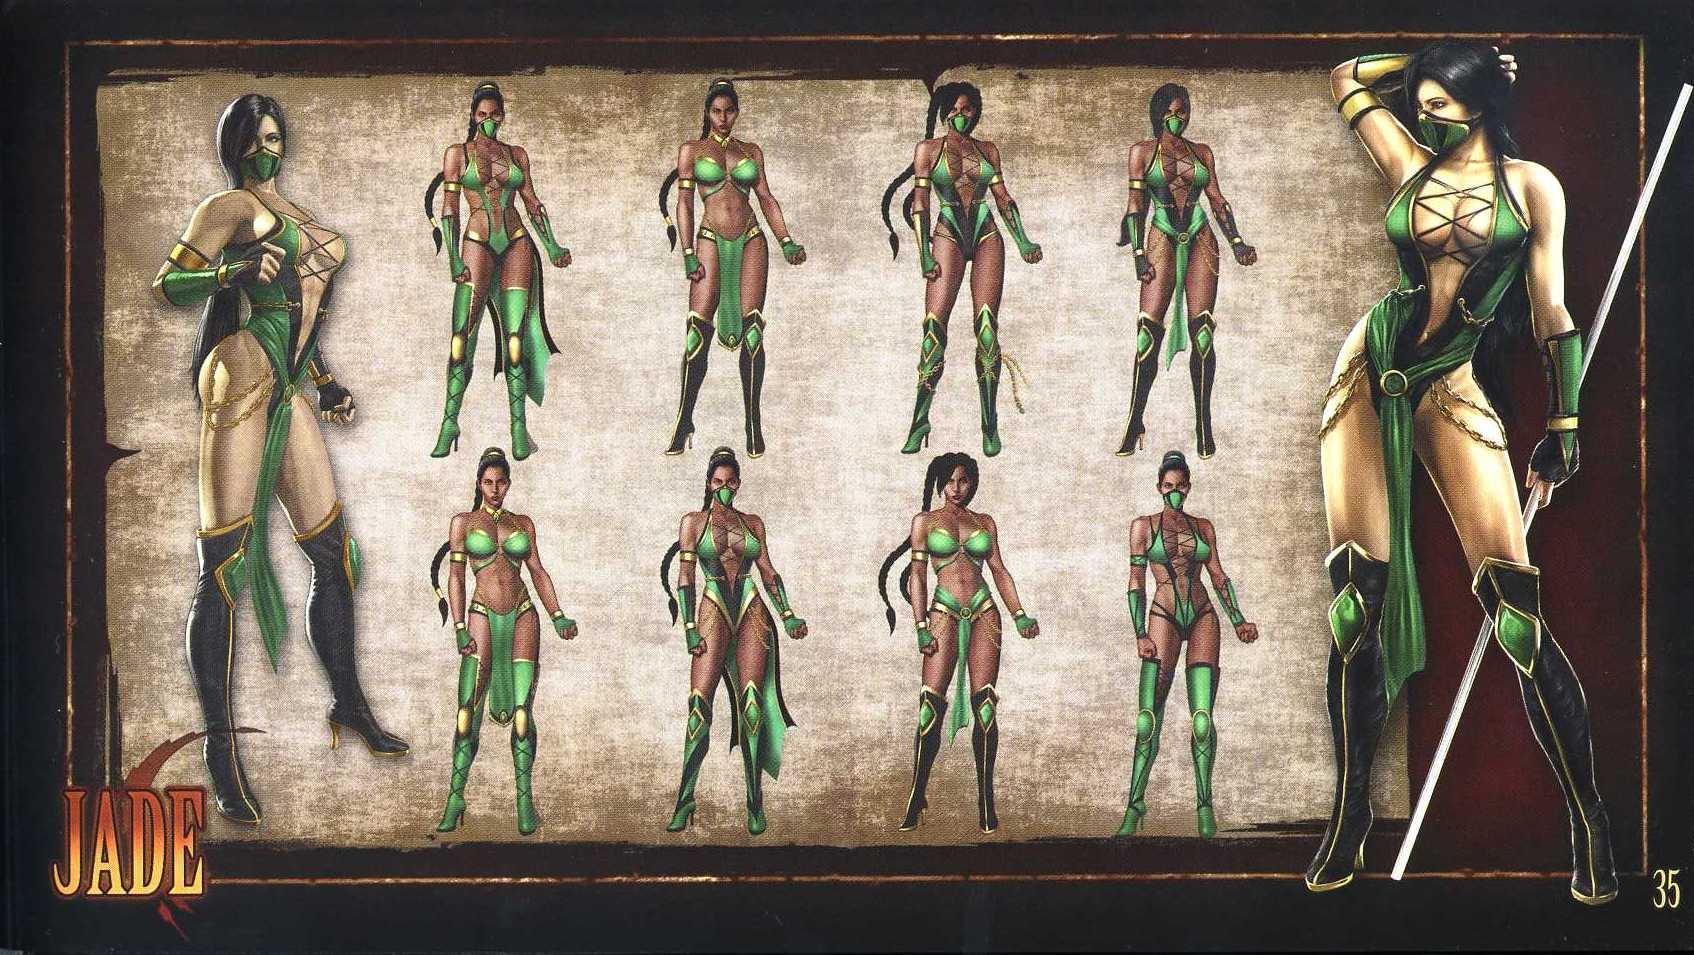 Jade dynasty nude mod sexy scene